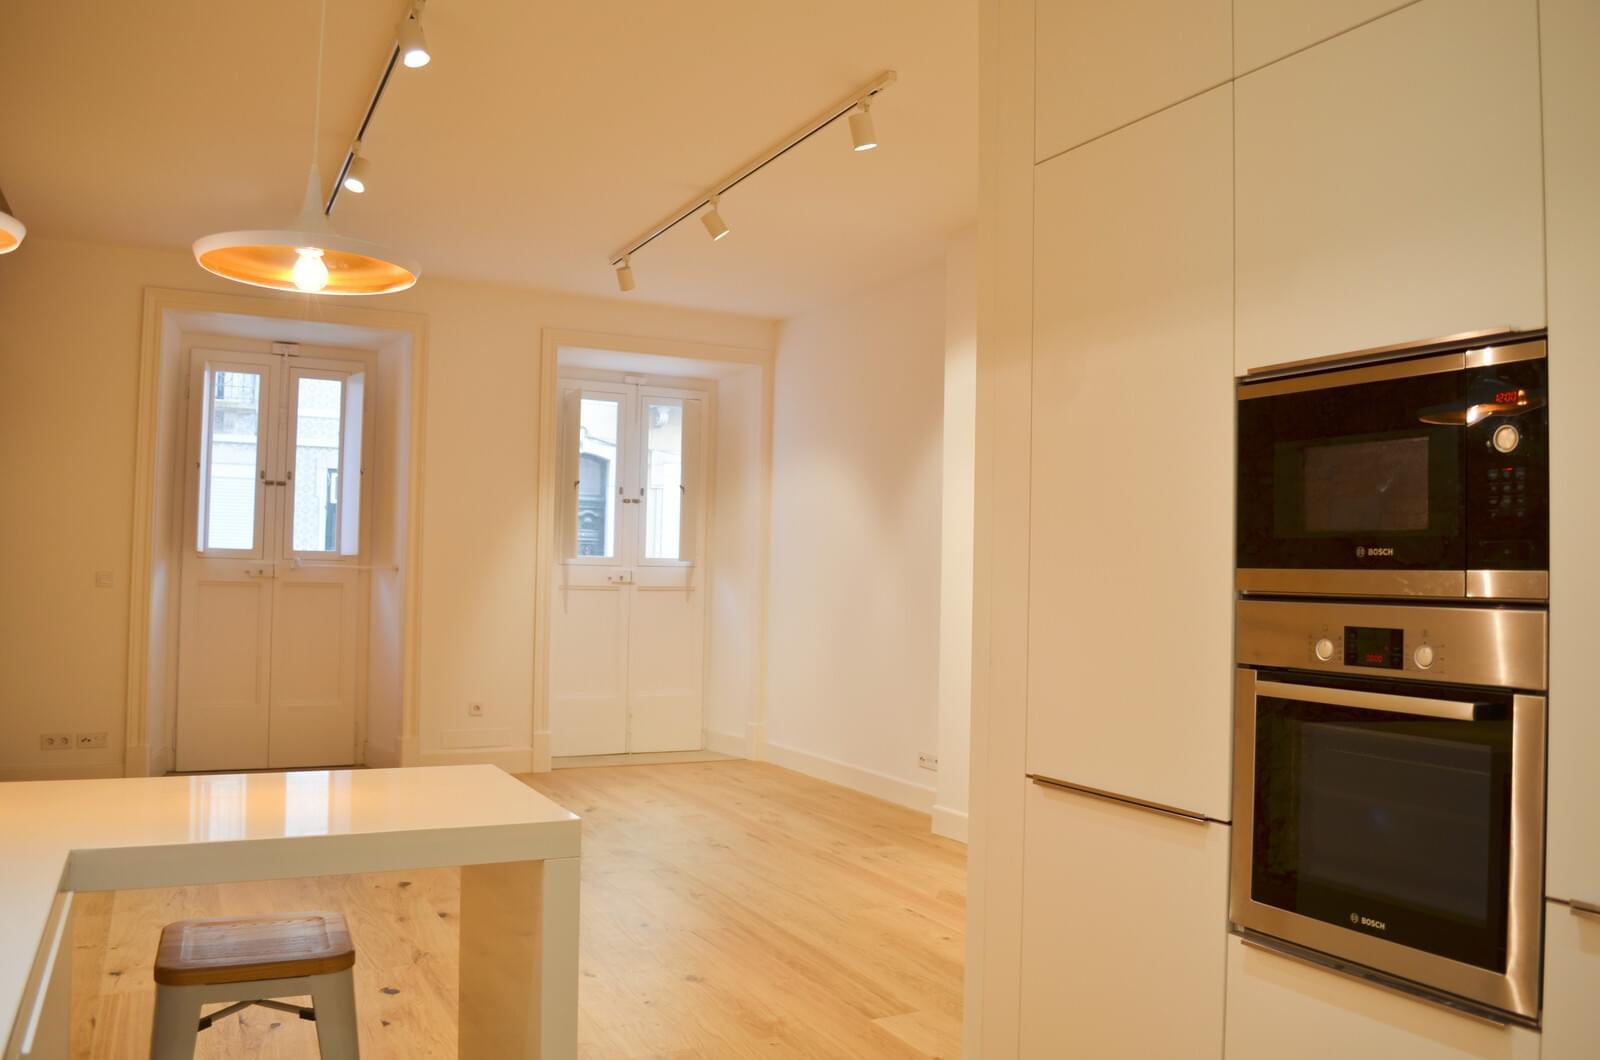 pf18801-apartamento-t2-lisboa-1efa1fc0-50be-48cd-98ed-0f3bb40bcc00